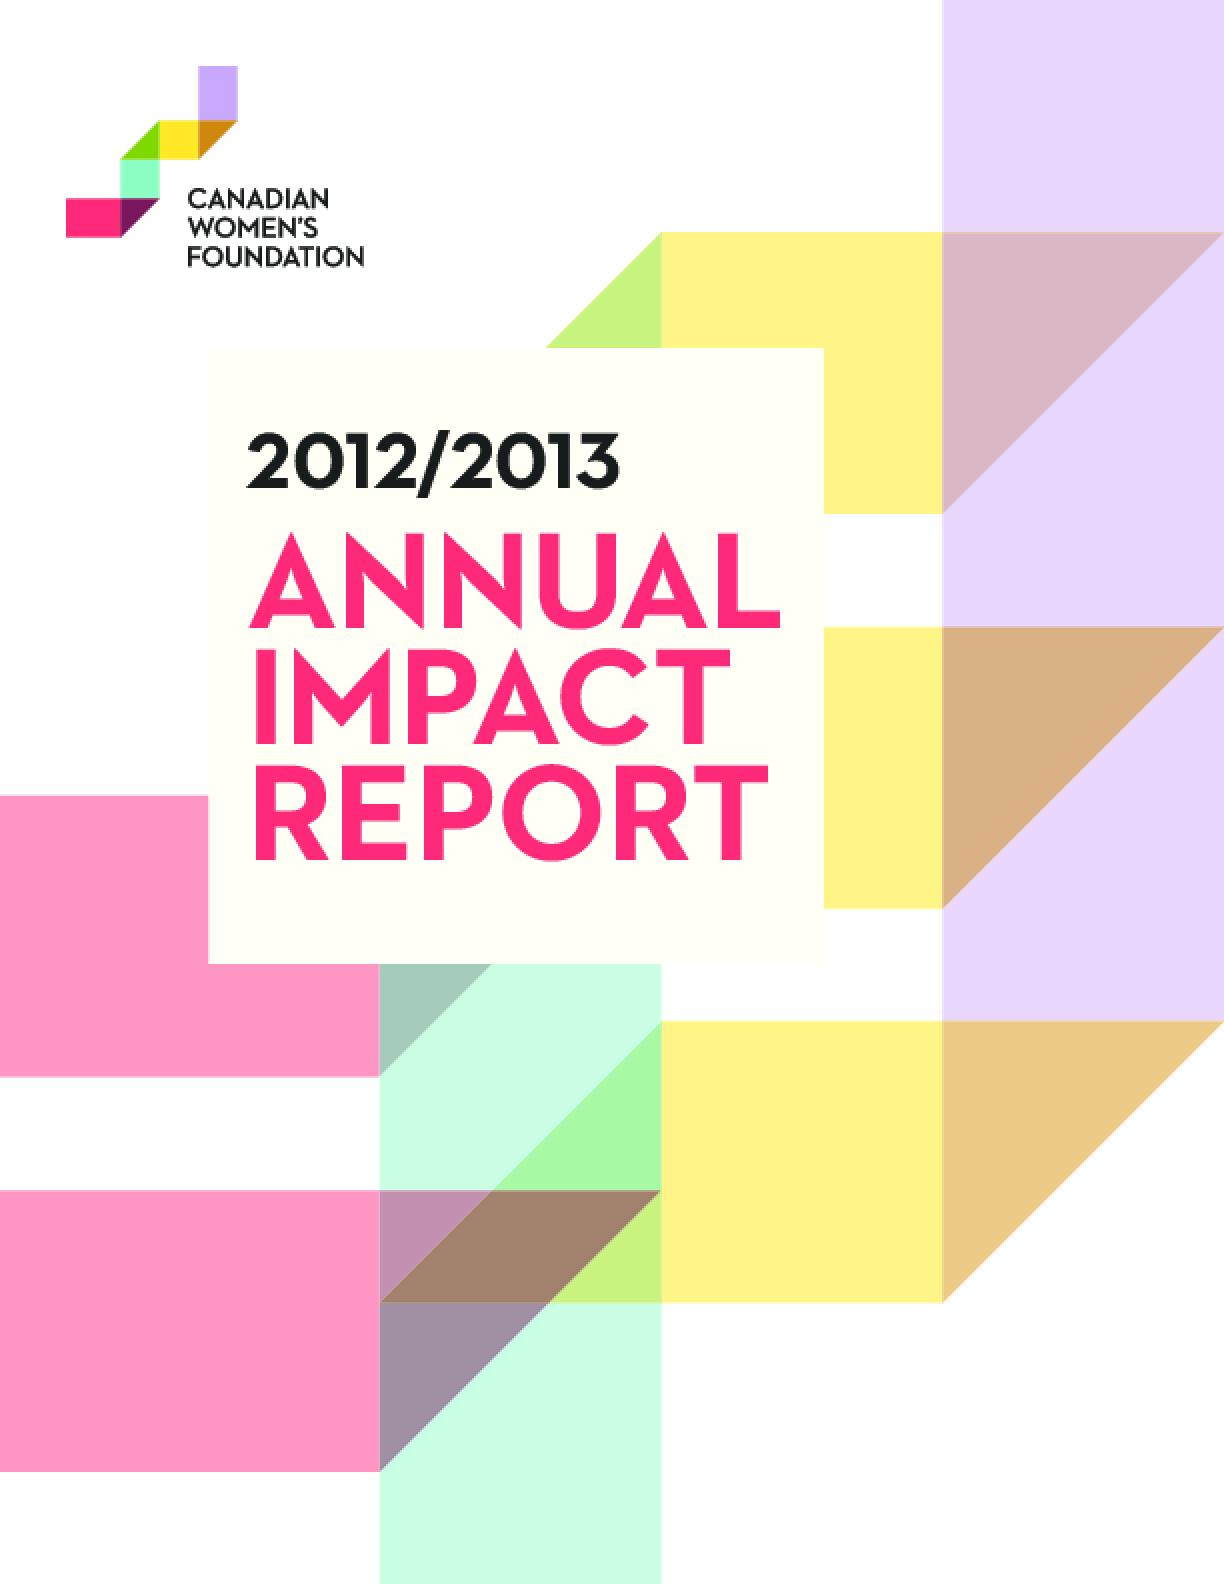 2012/2013 Annual Impact Report